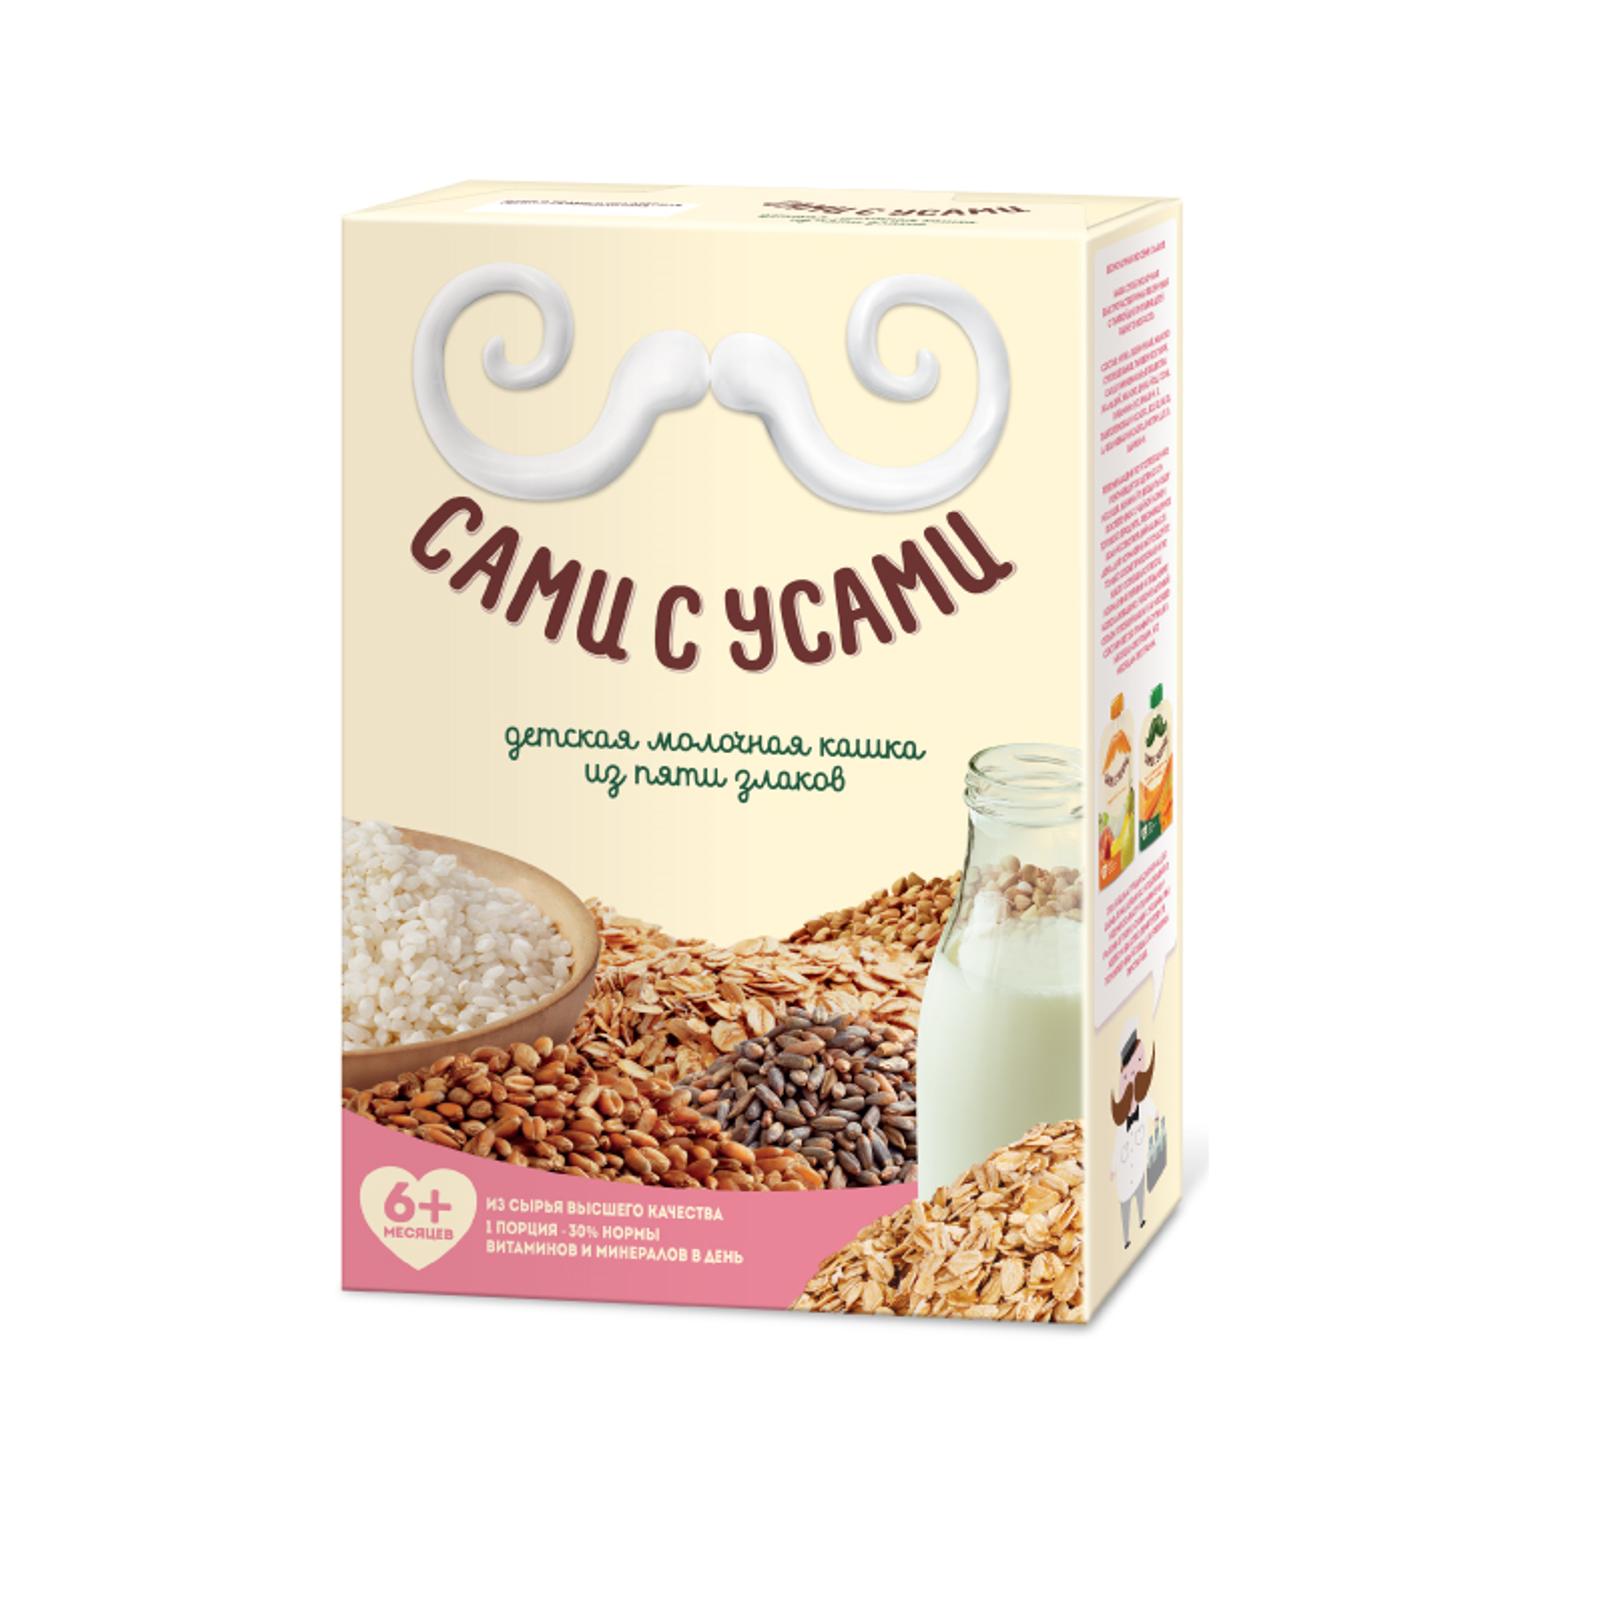 Каша Сами с усами молочная 200 гр 5 злаков (с 6 мес)<br>